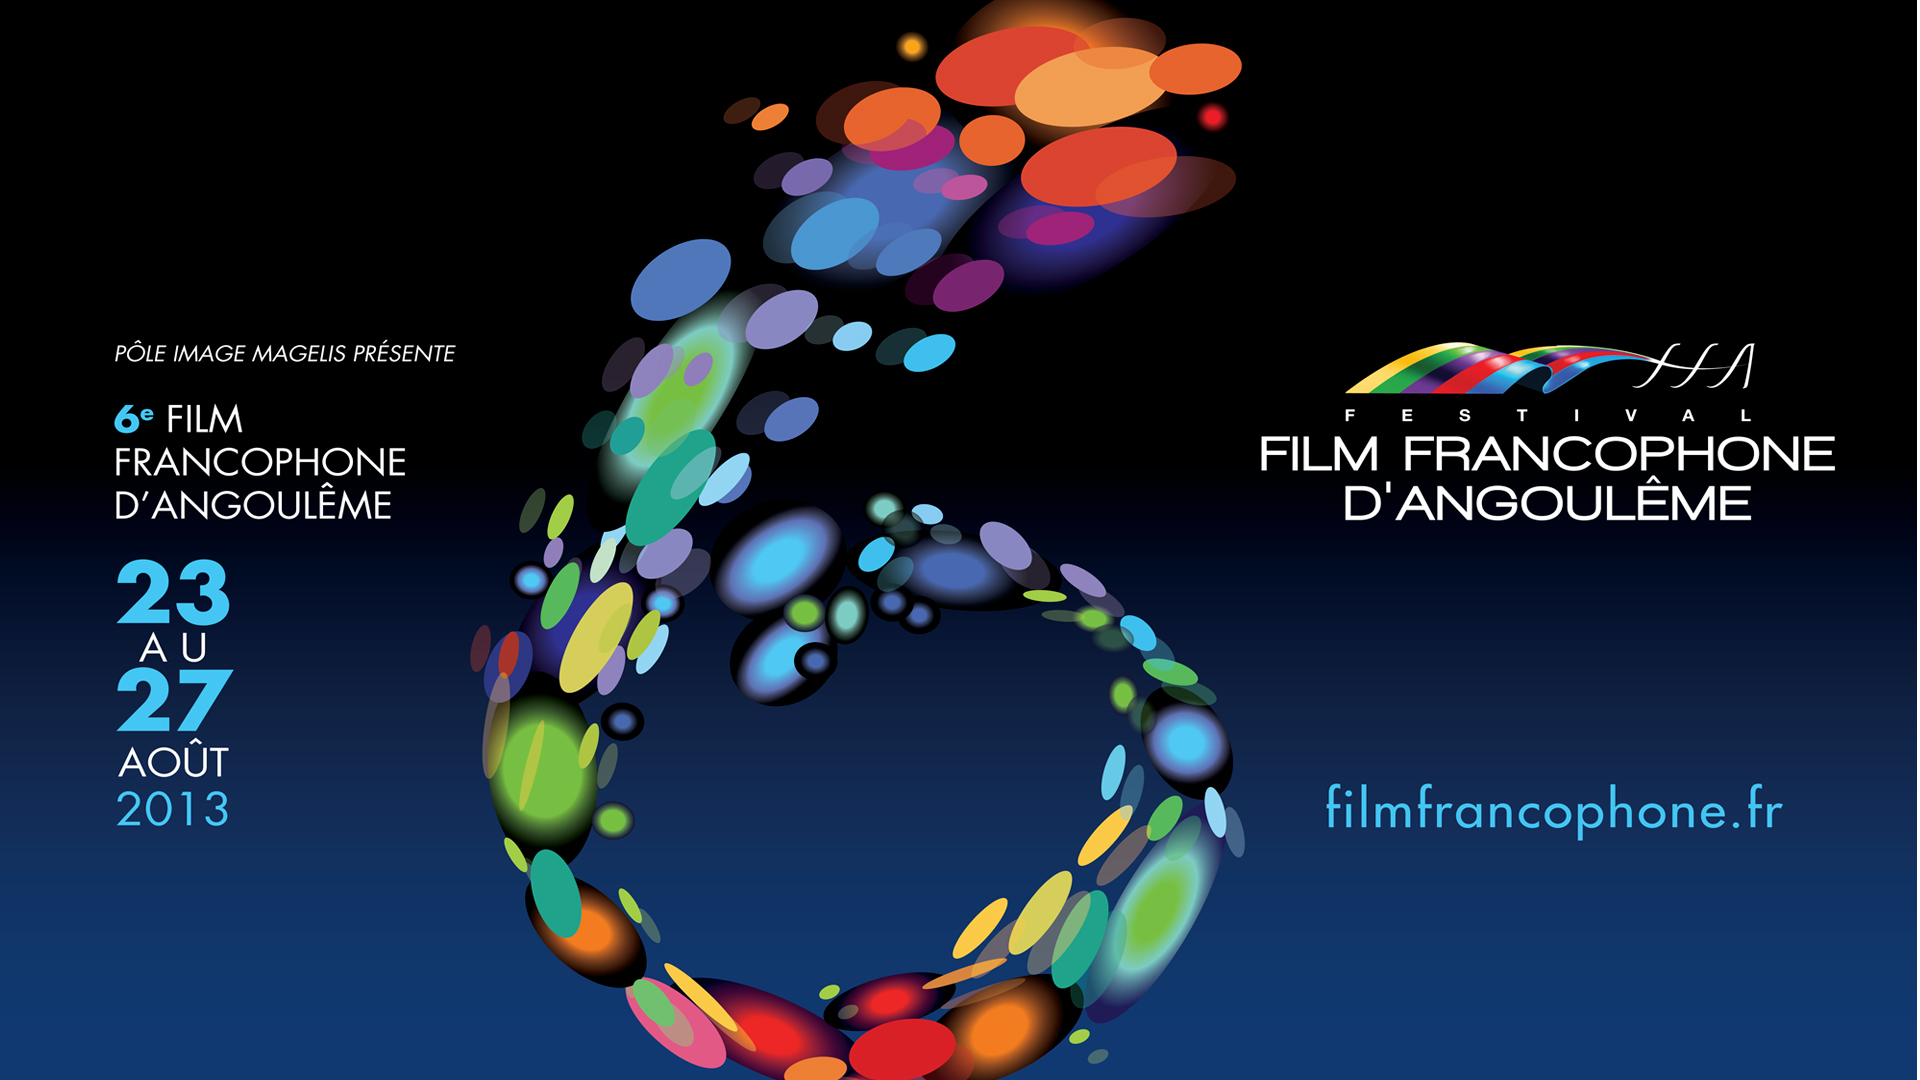 Festival du film francophone d'Angoulême 23-27 août 2014